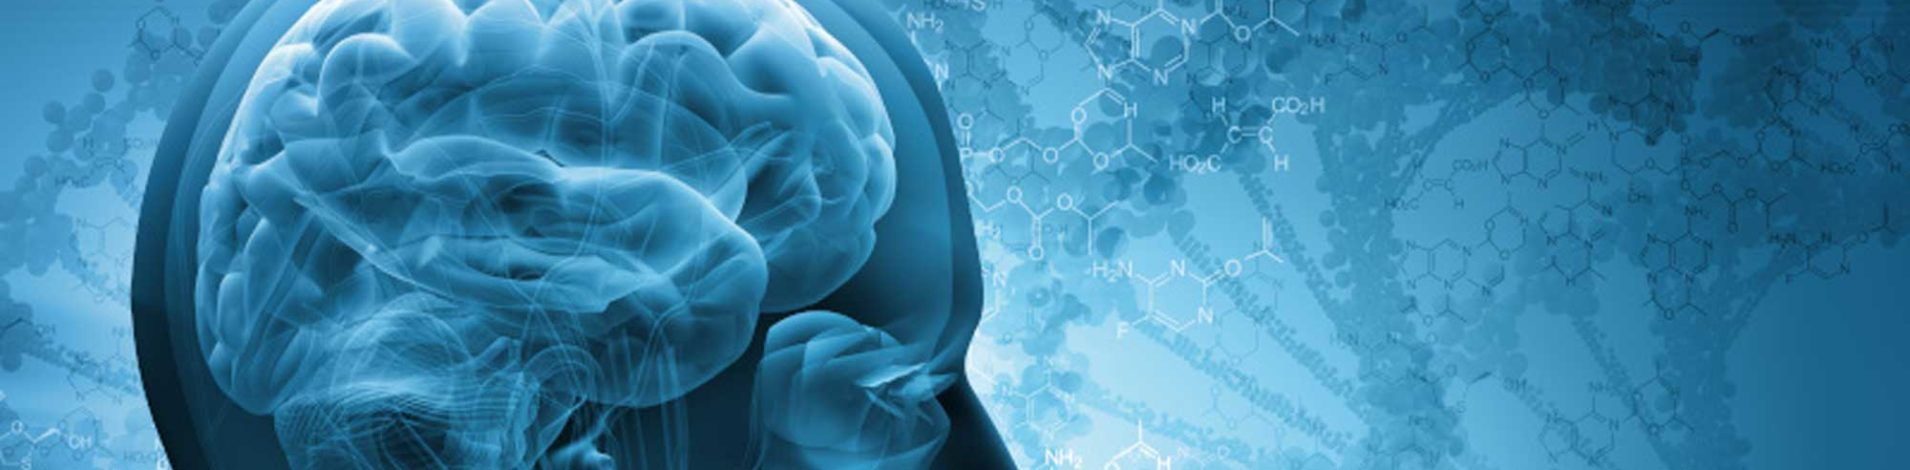 iscrd-brain-neuroinitiative-background-2000-px